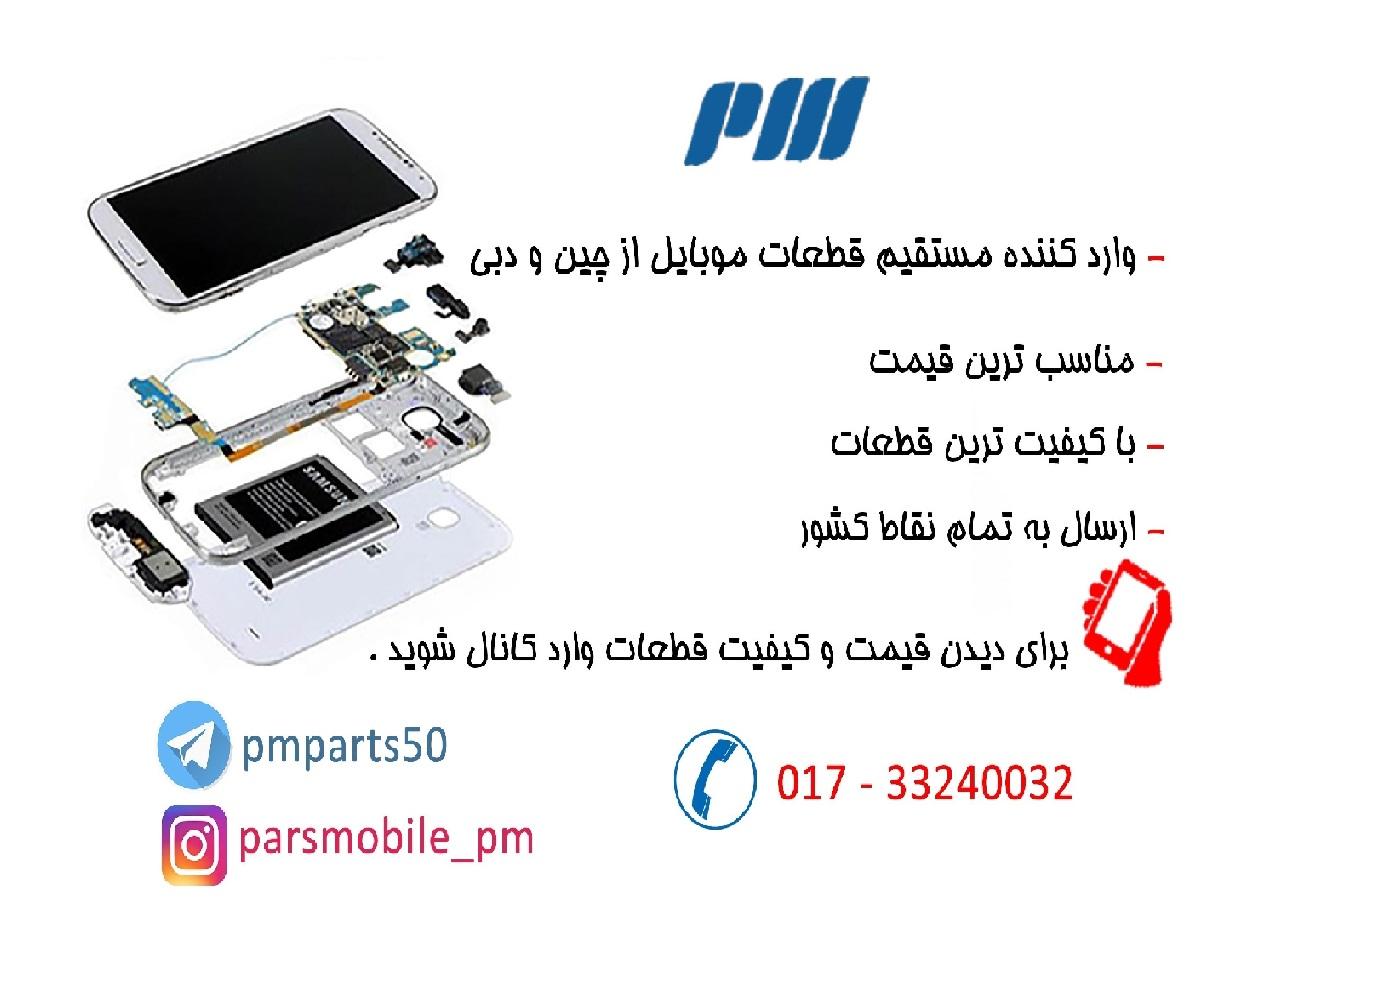 pm - وارد کننده مستقیم قطعات موبایل ازچین ودبی